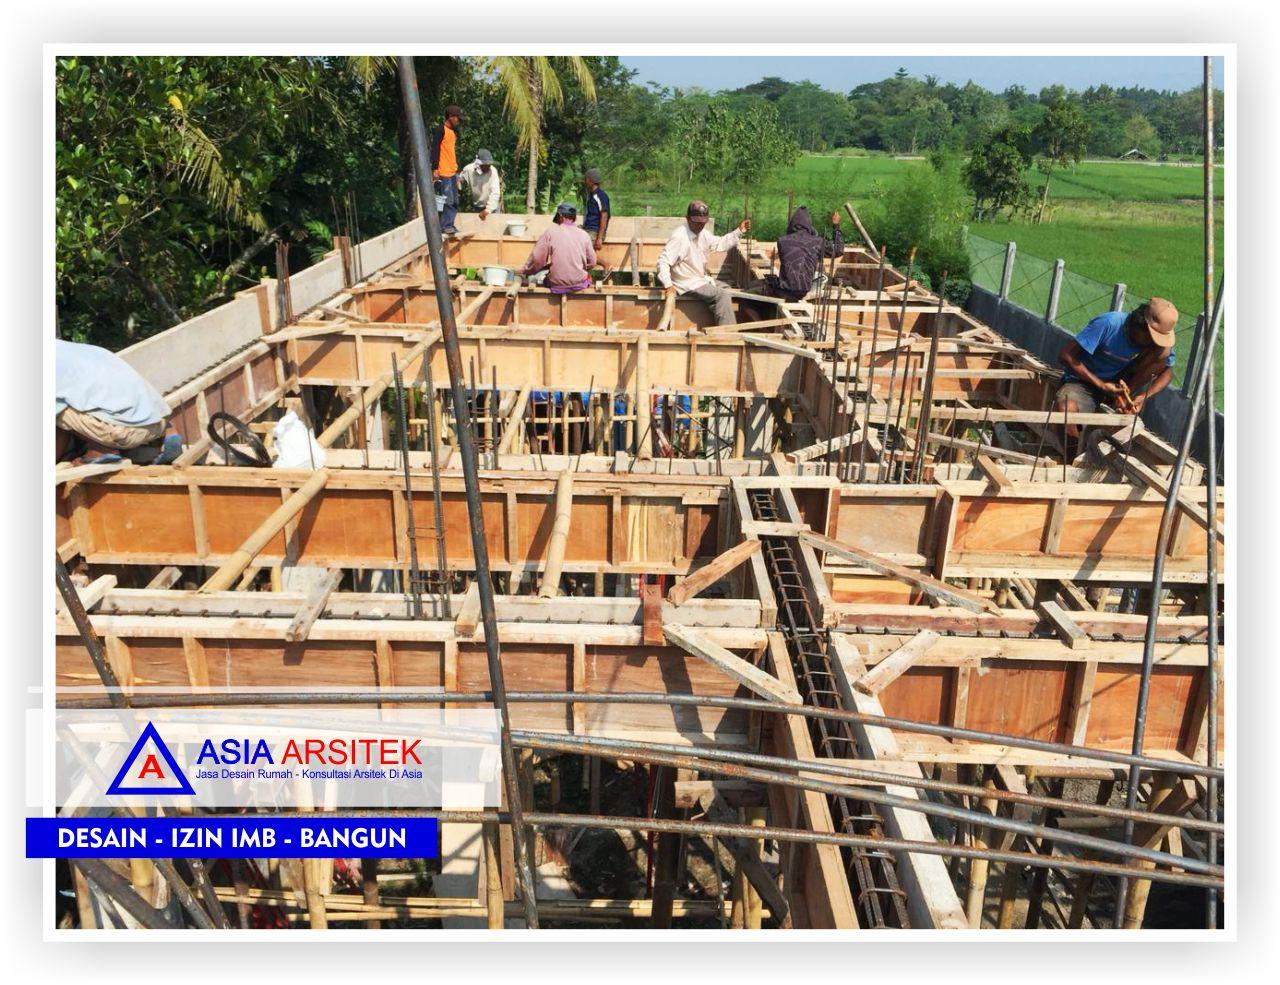 Proses-pengerjaan-struktur-balok-rumah